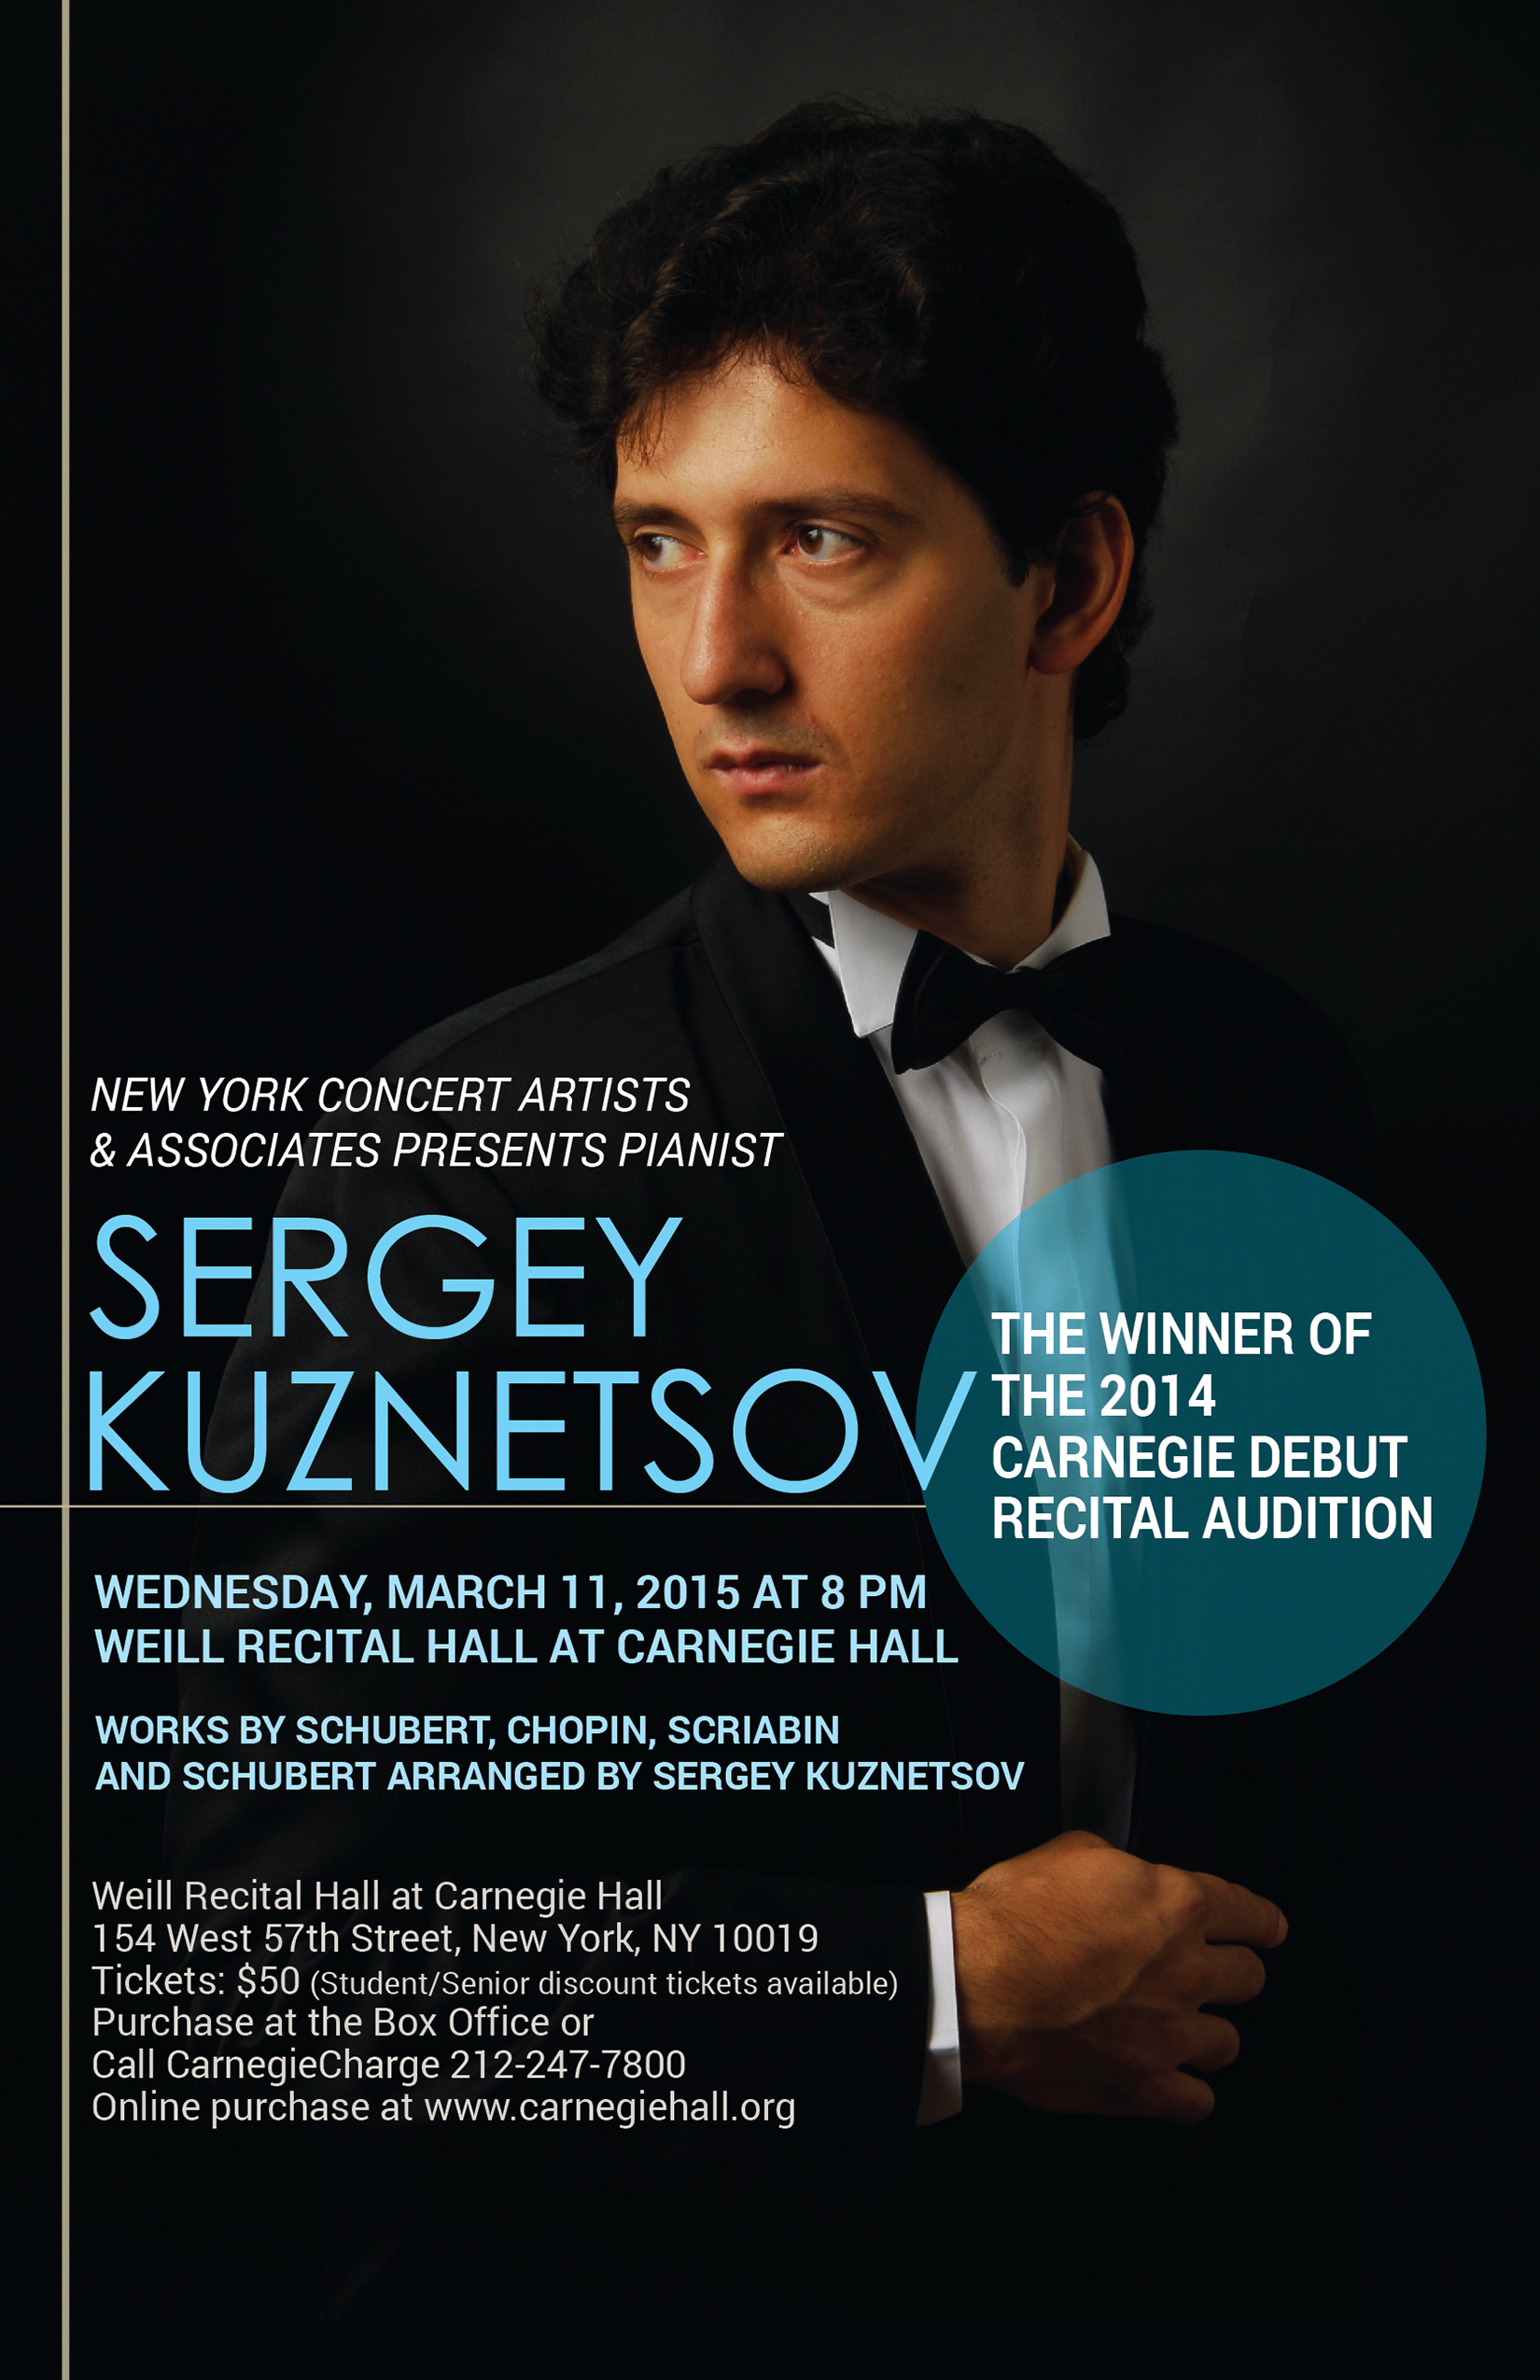 SergeyKuznetsov_March-11-2015_5.5x8.5_front.jpg